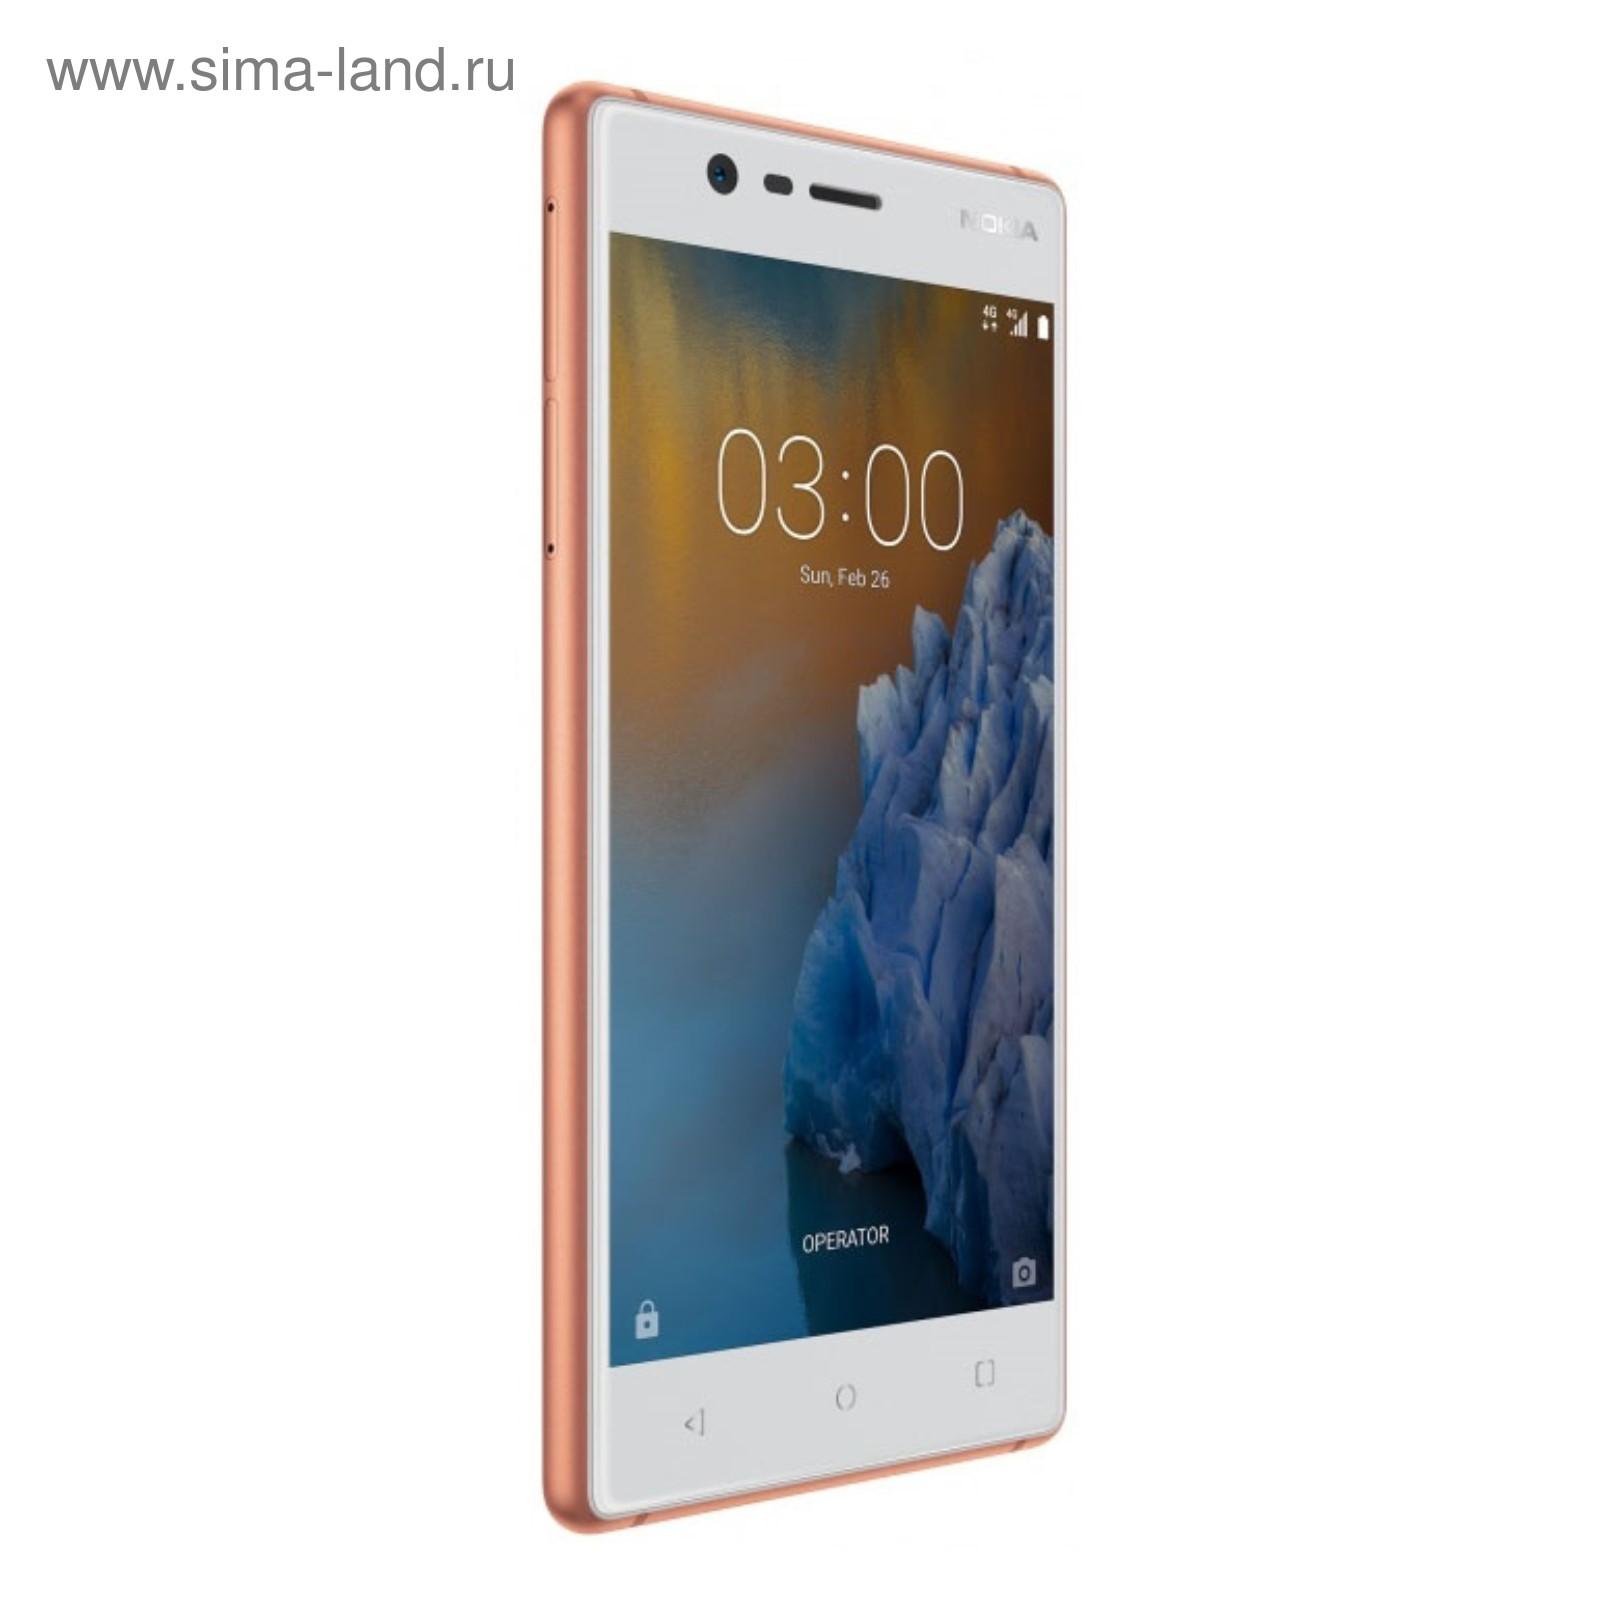 d406639063f3a Смартфон Nokia 3 DS Copper White LTE TA-1032, цвет медный белый ...